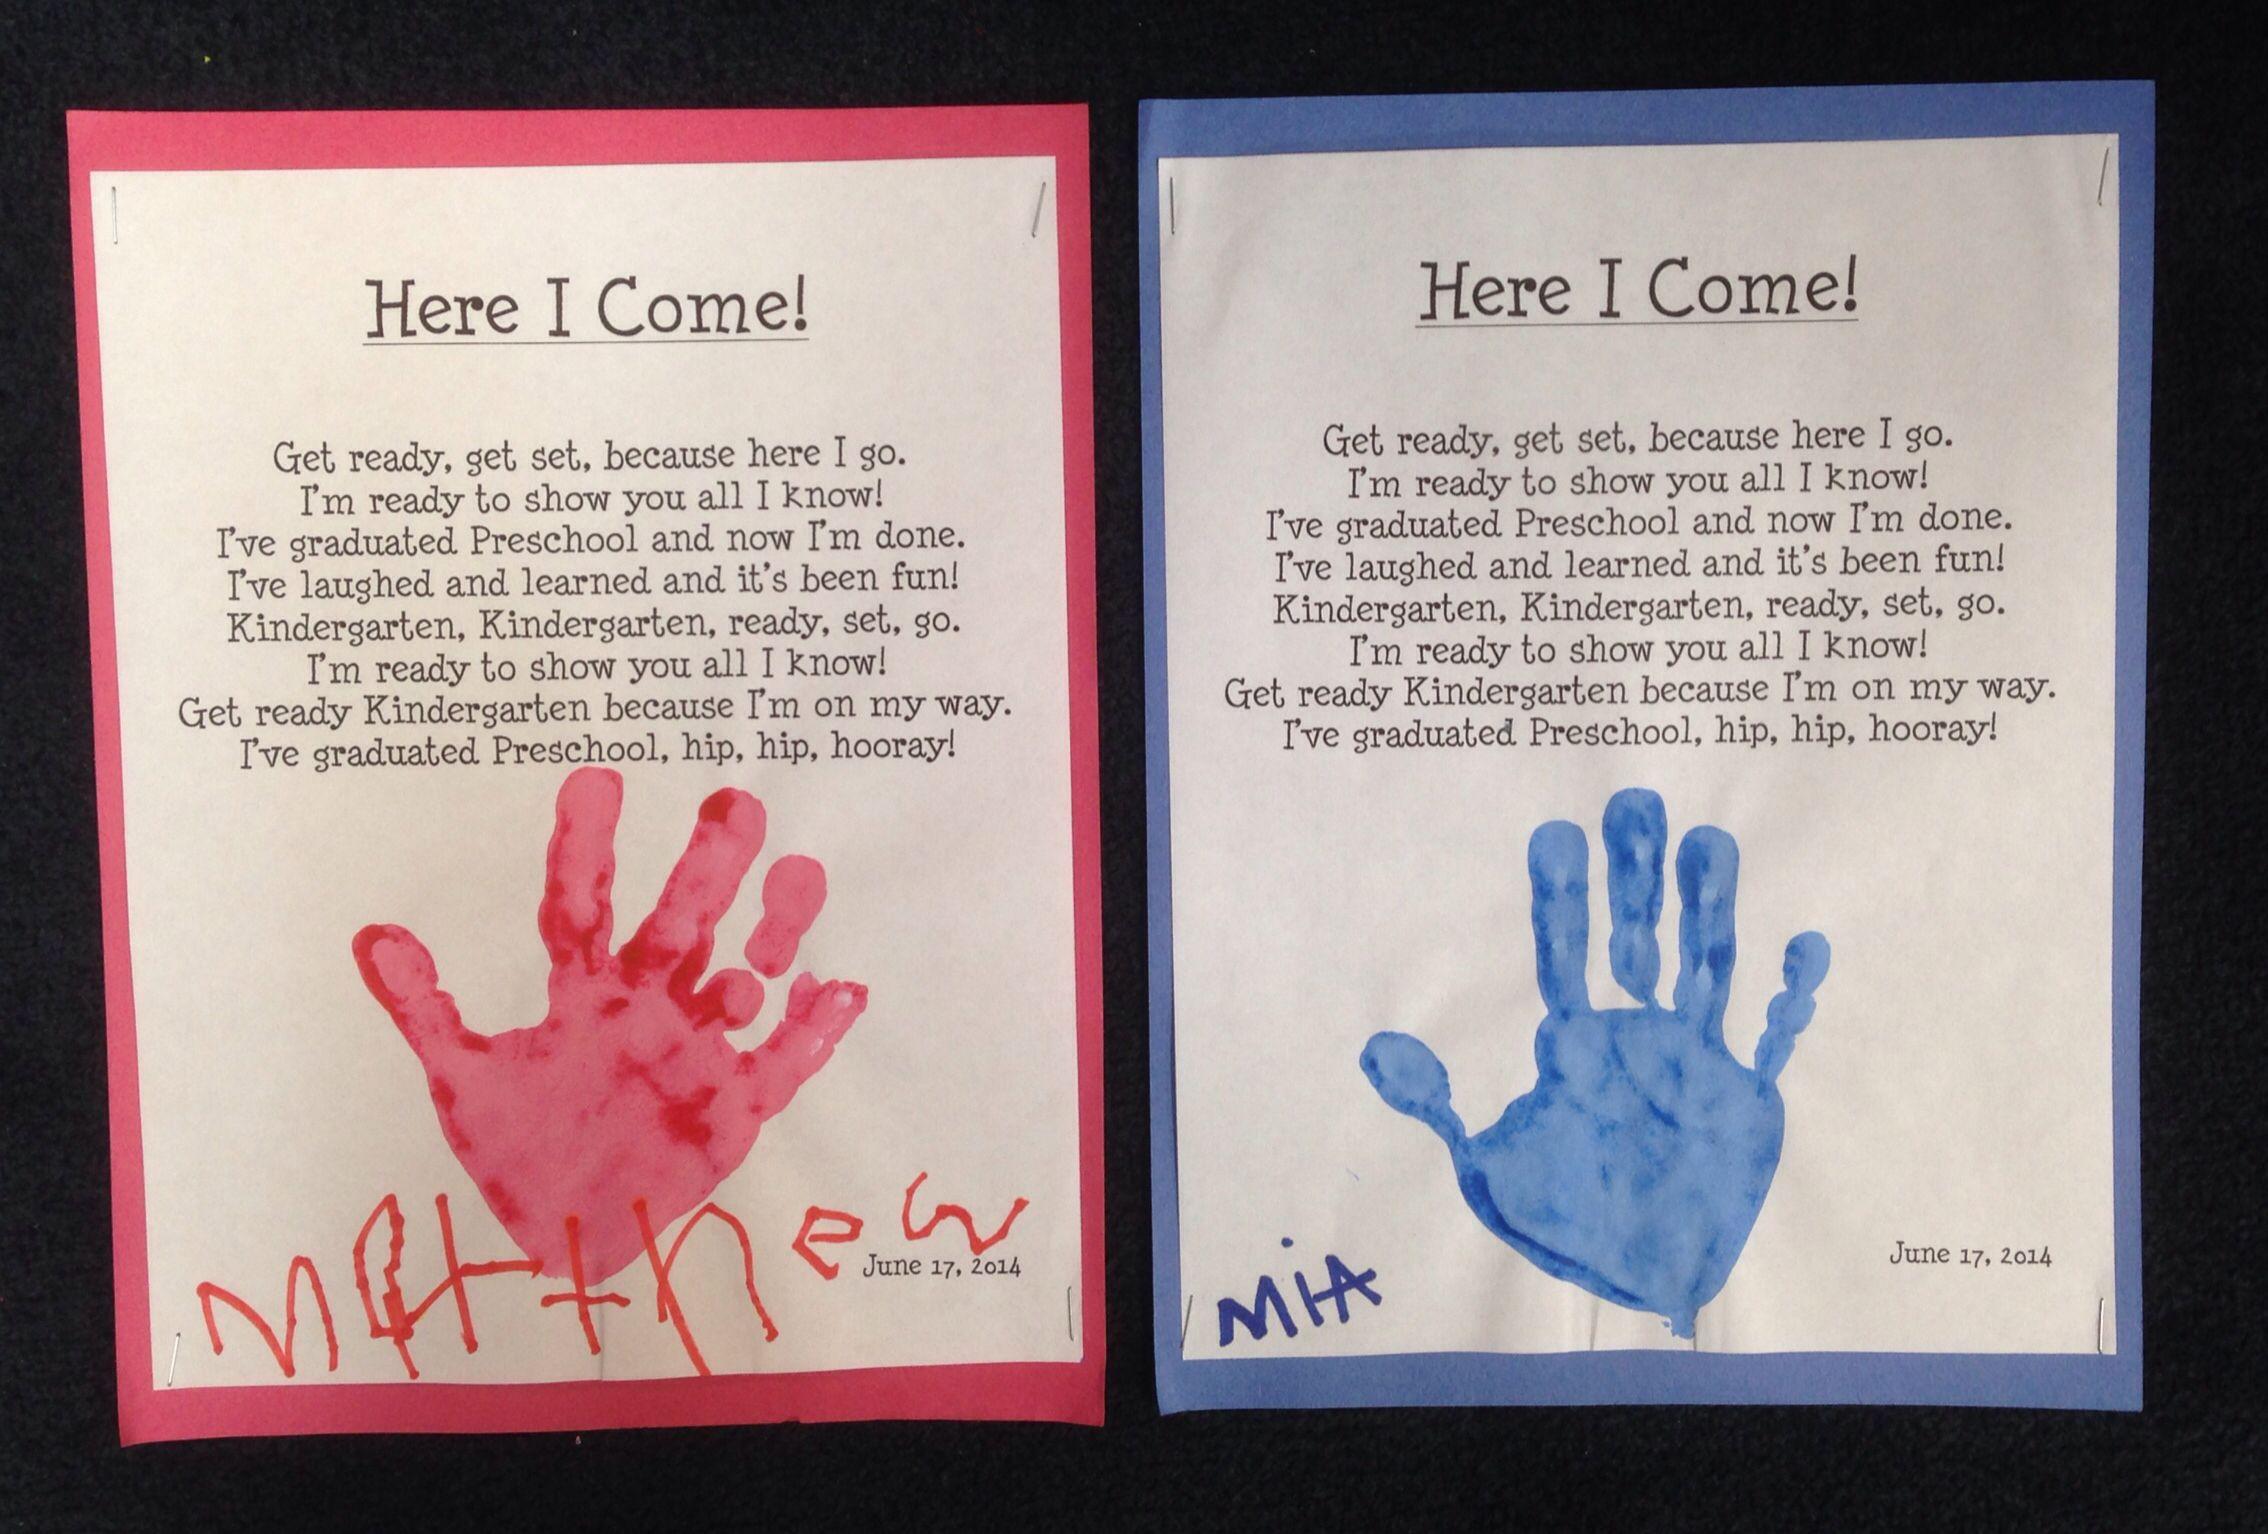 Here I Come Pre K Graduation Poem With Handprint